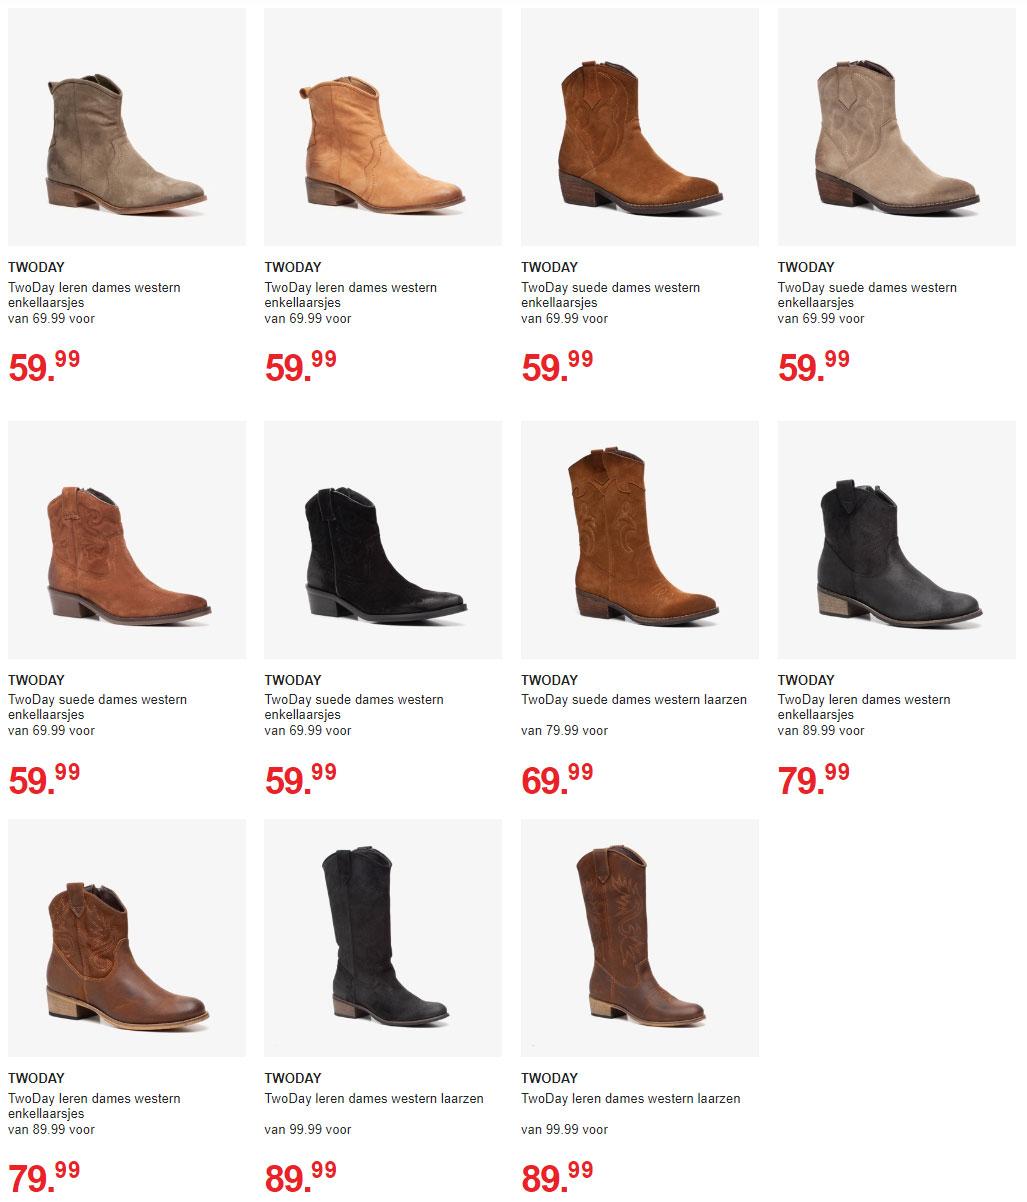 Suède cowboyboots -20% + €5 extra = va €43,99 @ Scapino